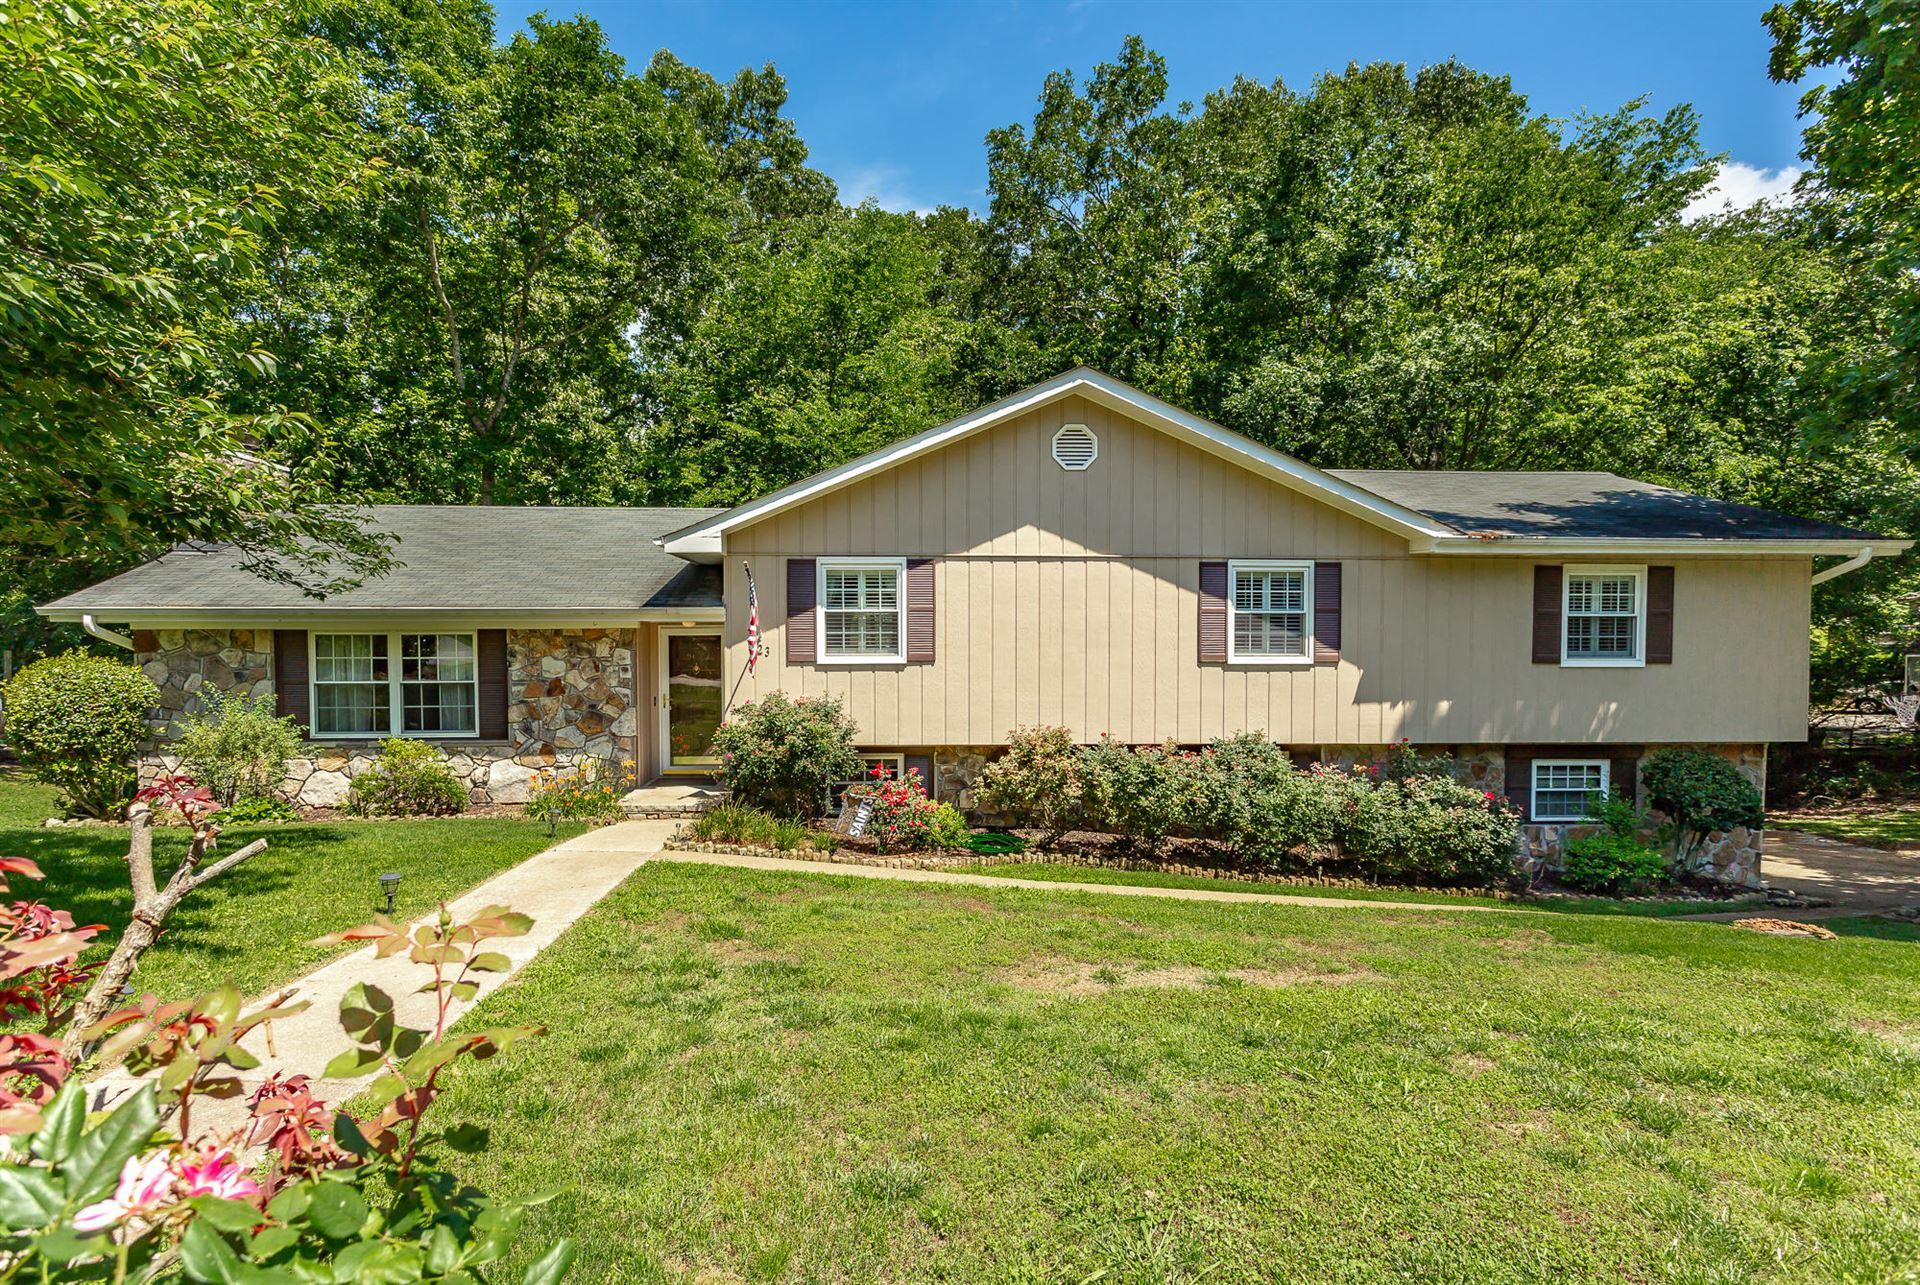 723 Swansons Ridge Rd, Chattanooga, TN 37421 - #: 1318789